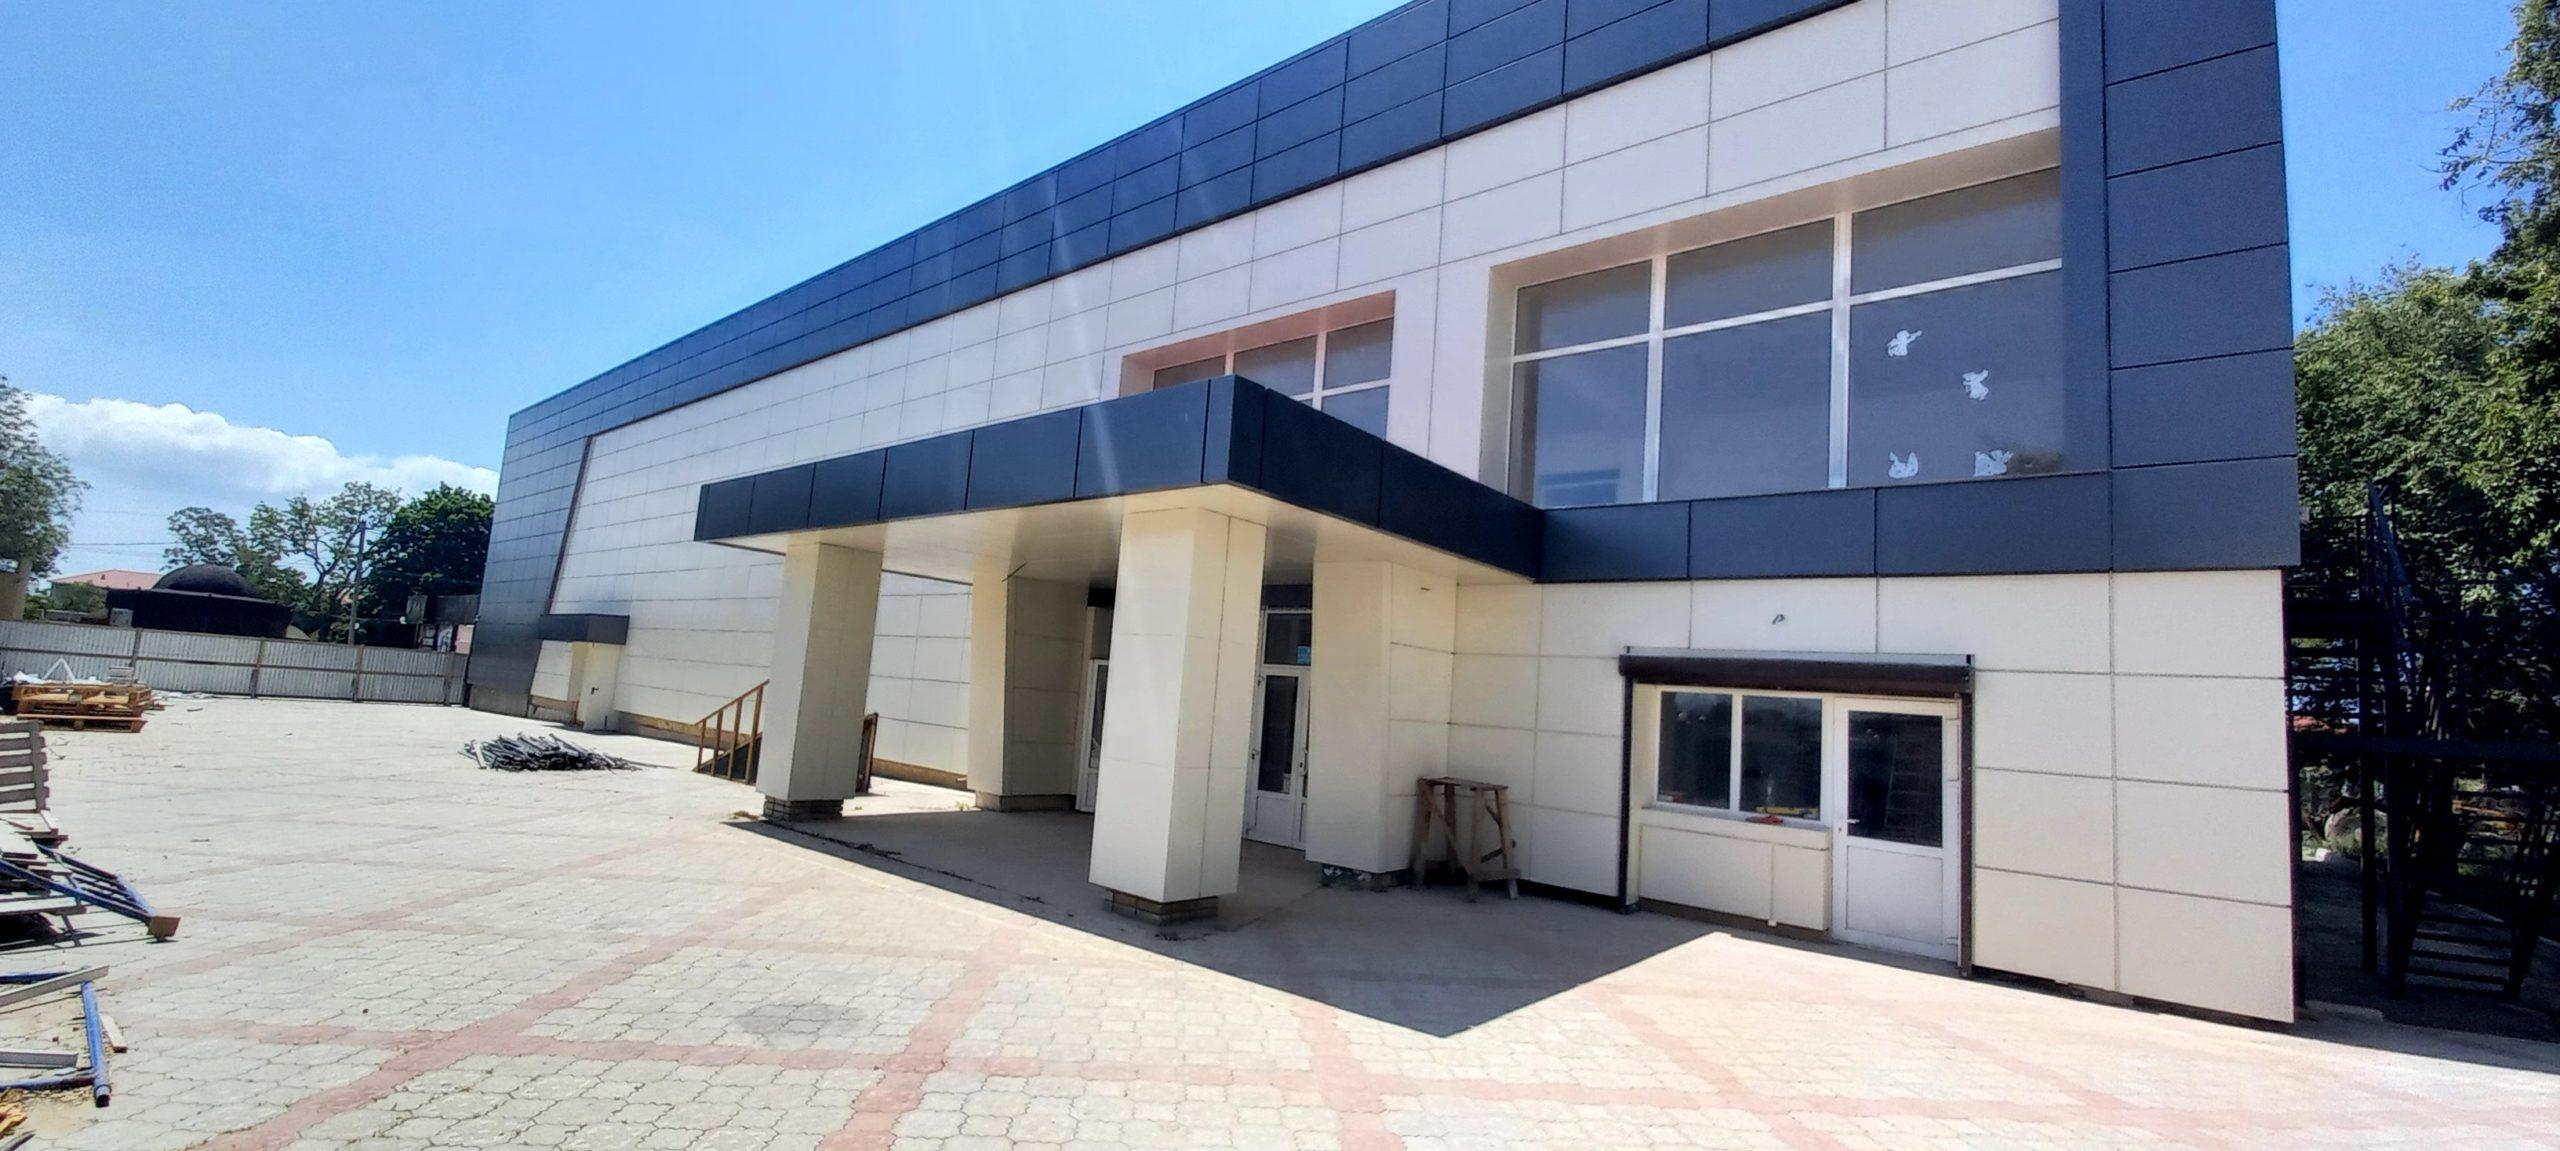 Фасад Межводненского СДК